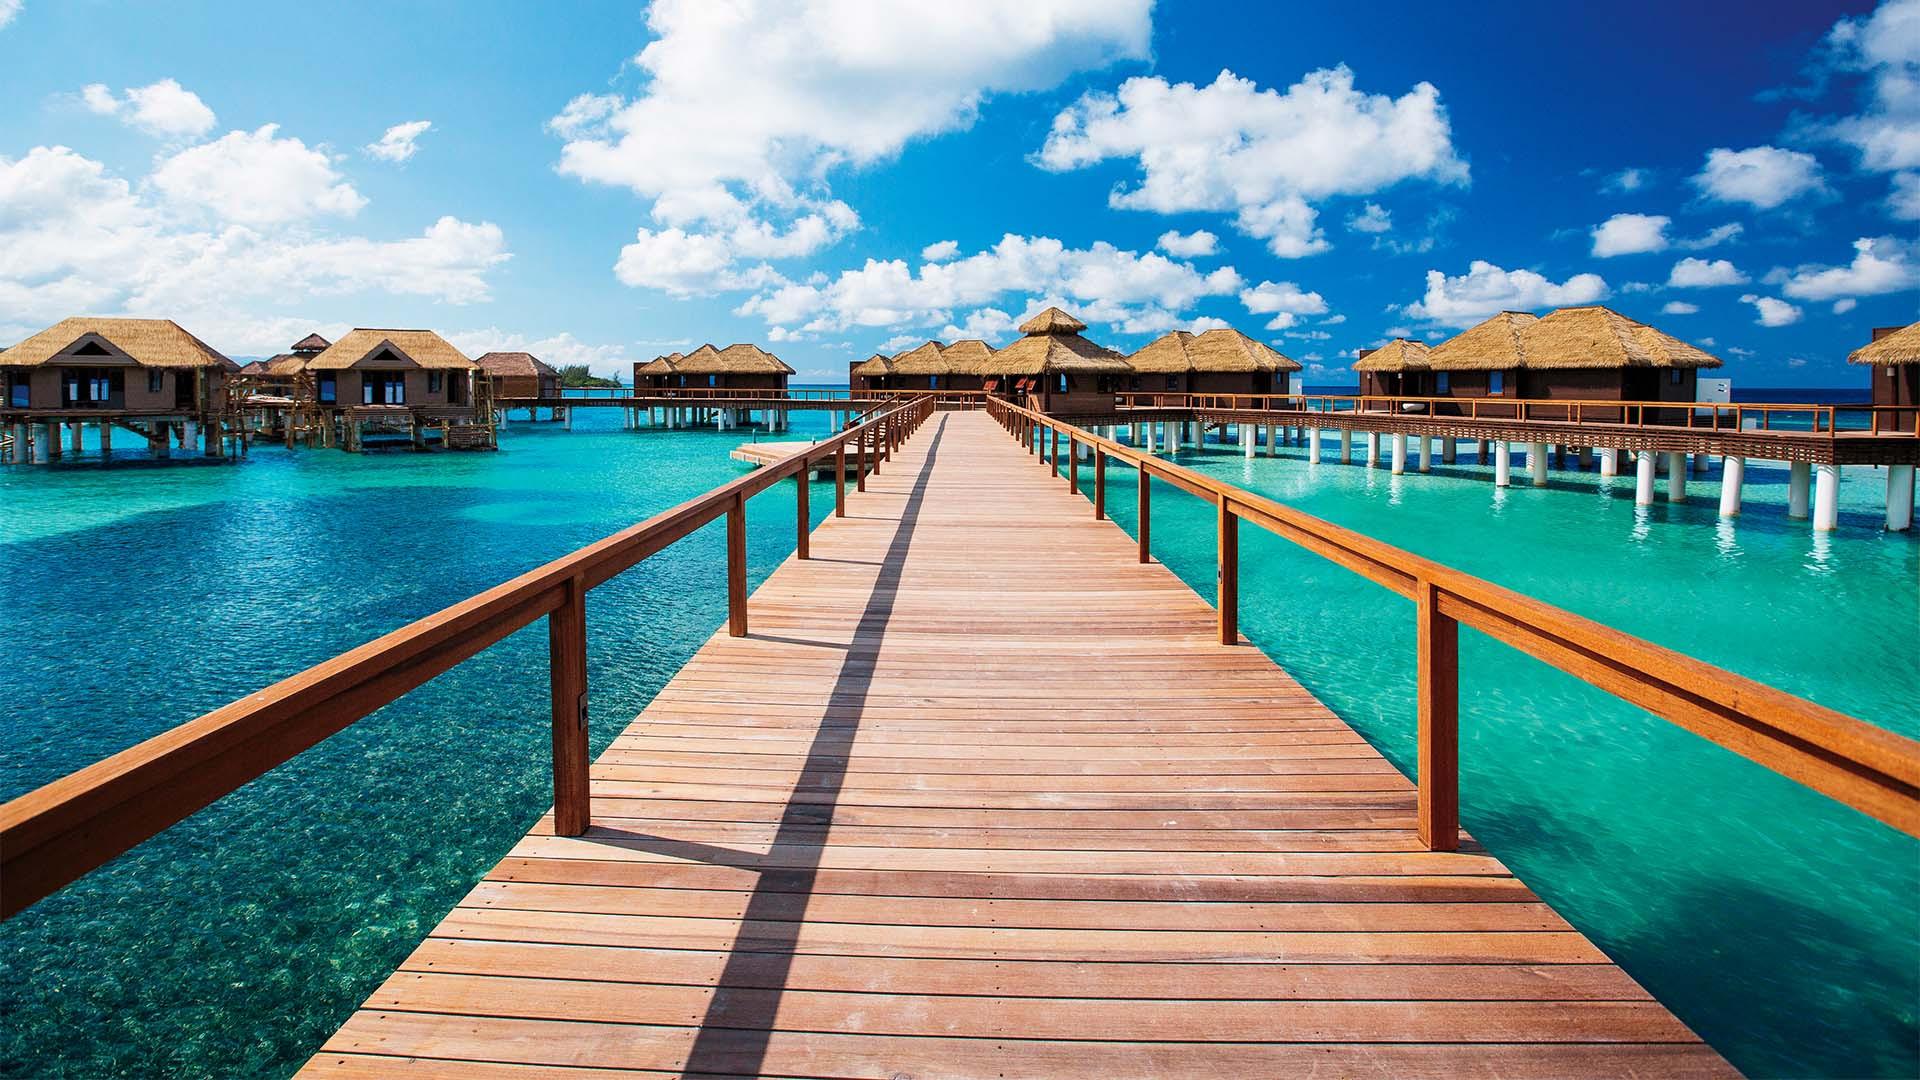 Butlers pontoon at Sandals overthe water villas